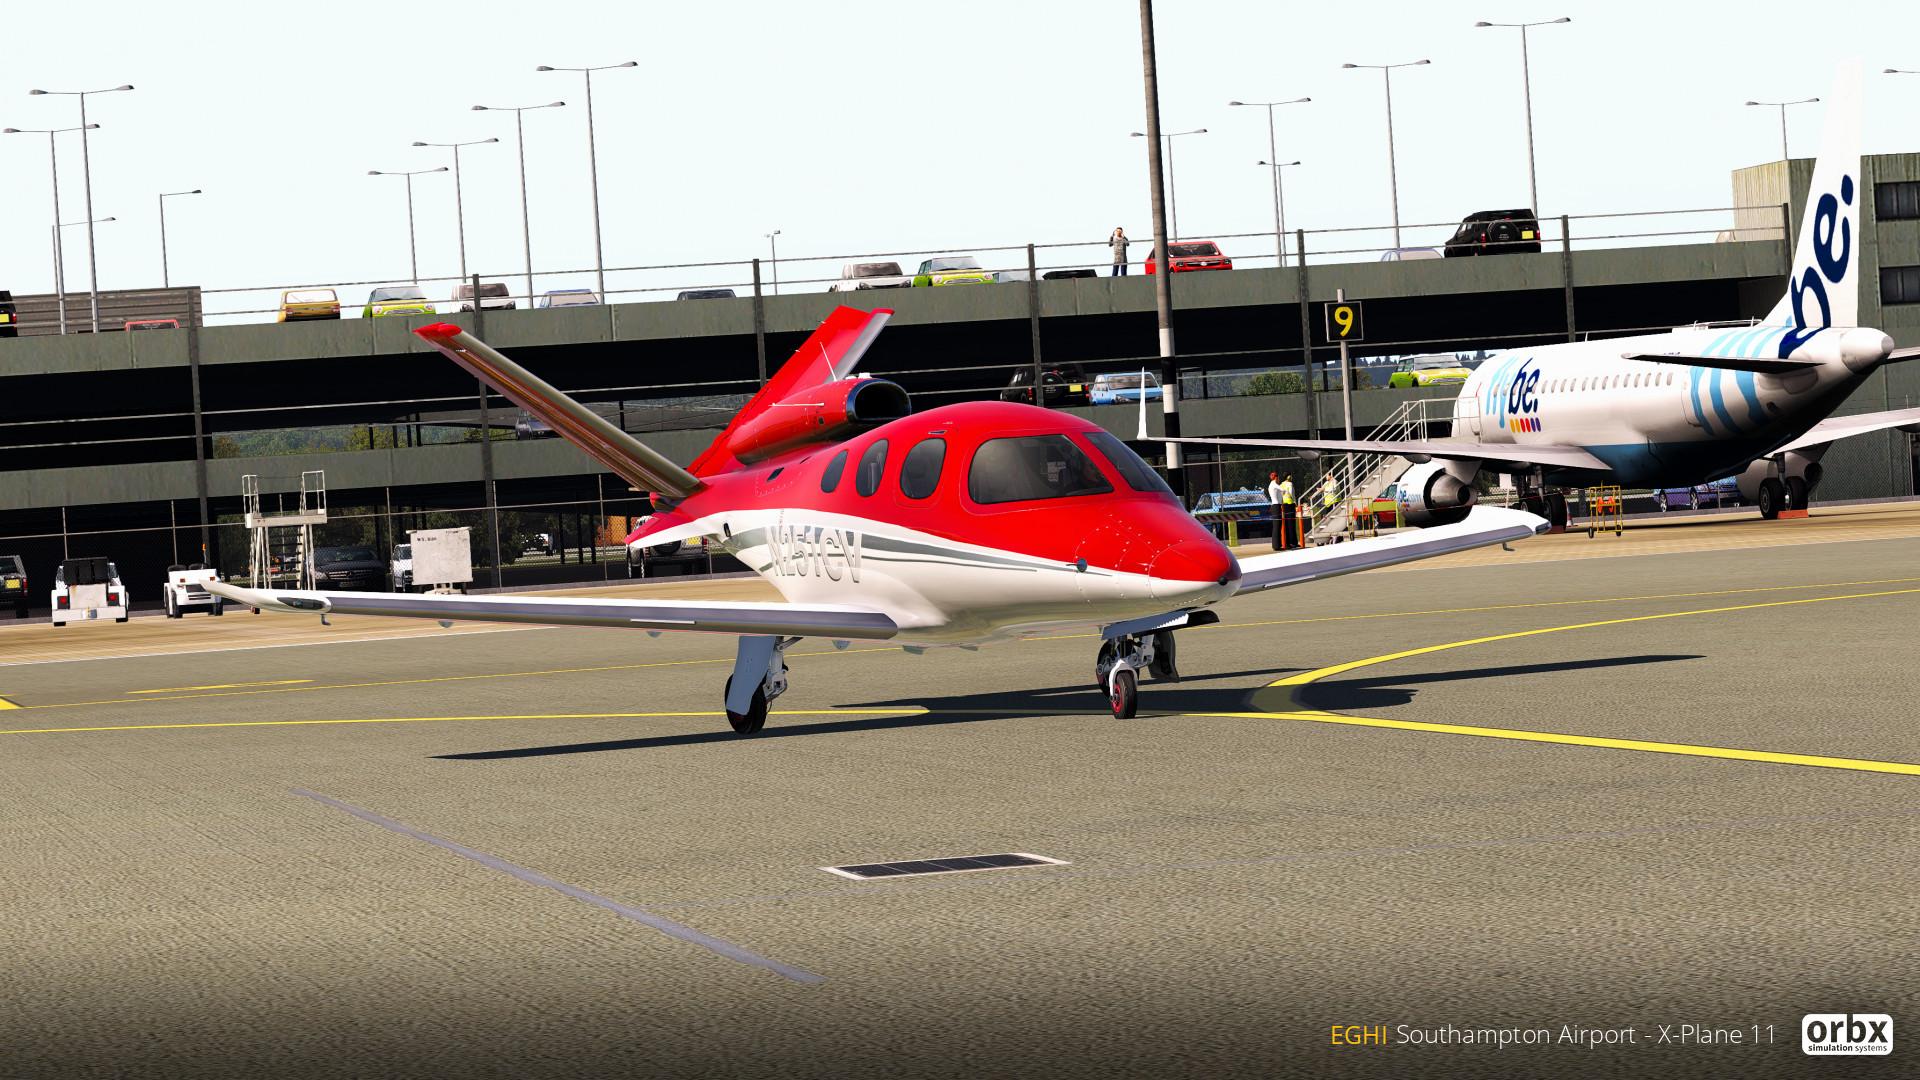 EGHI Southampton Airport